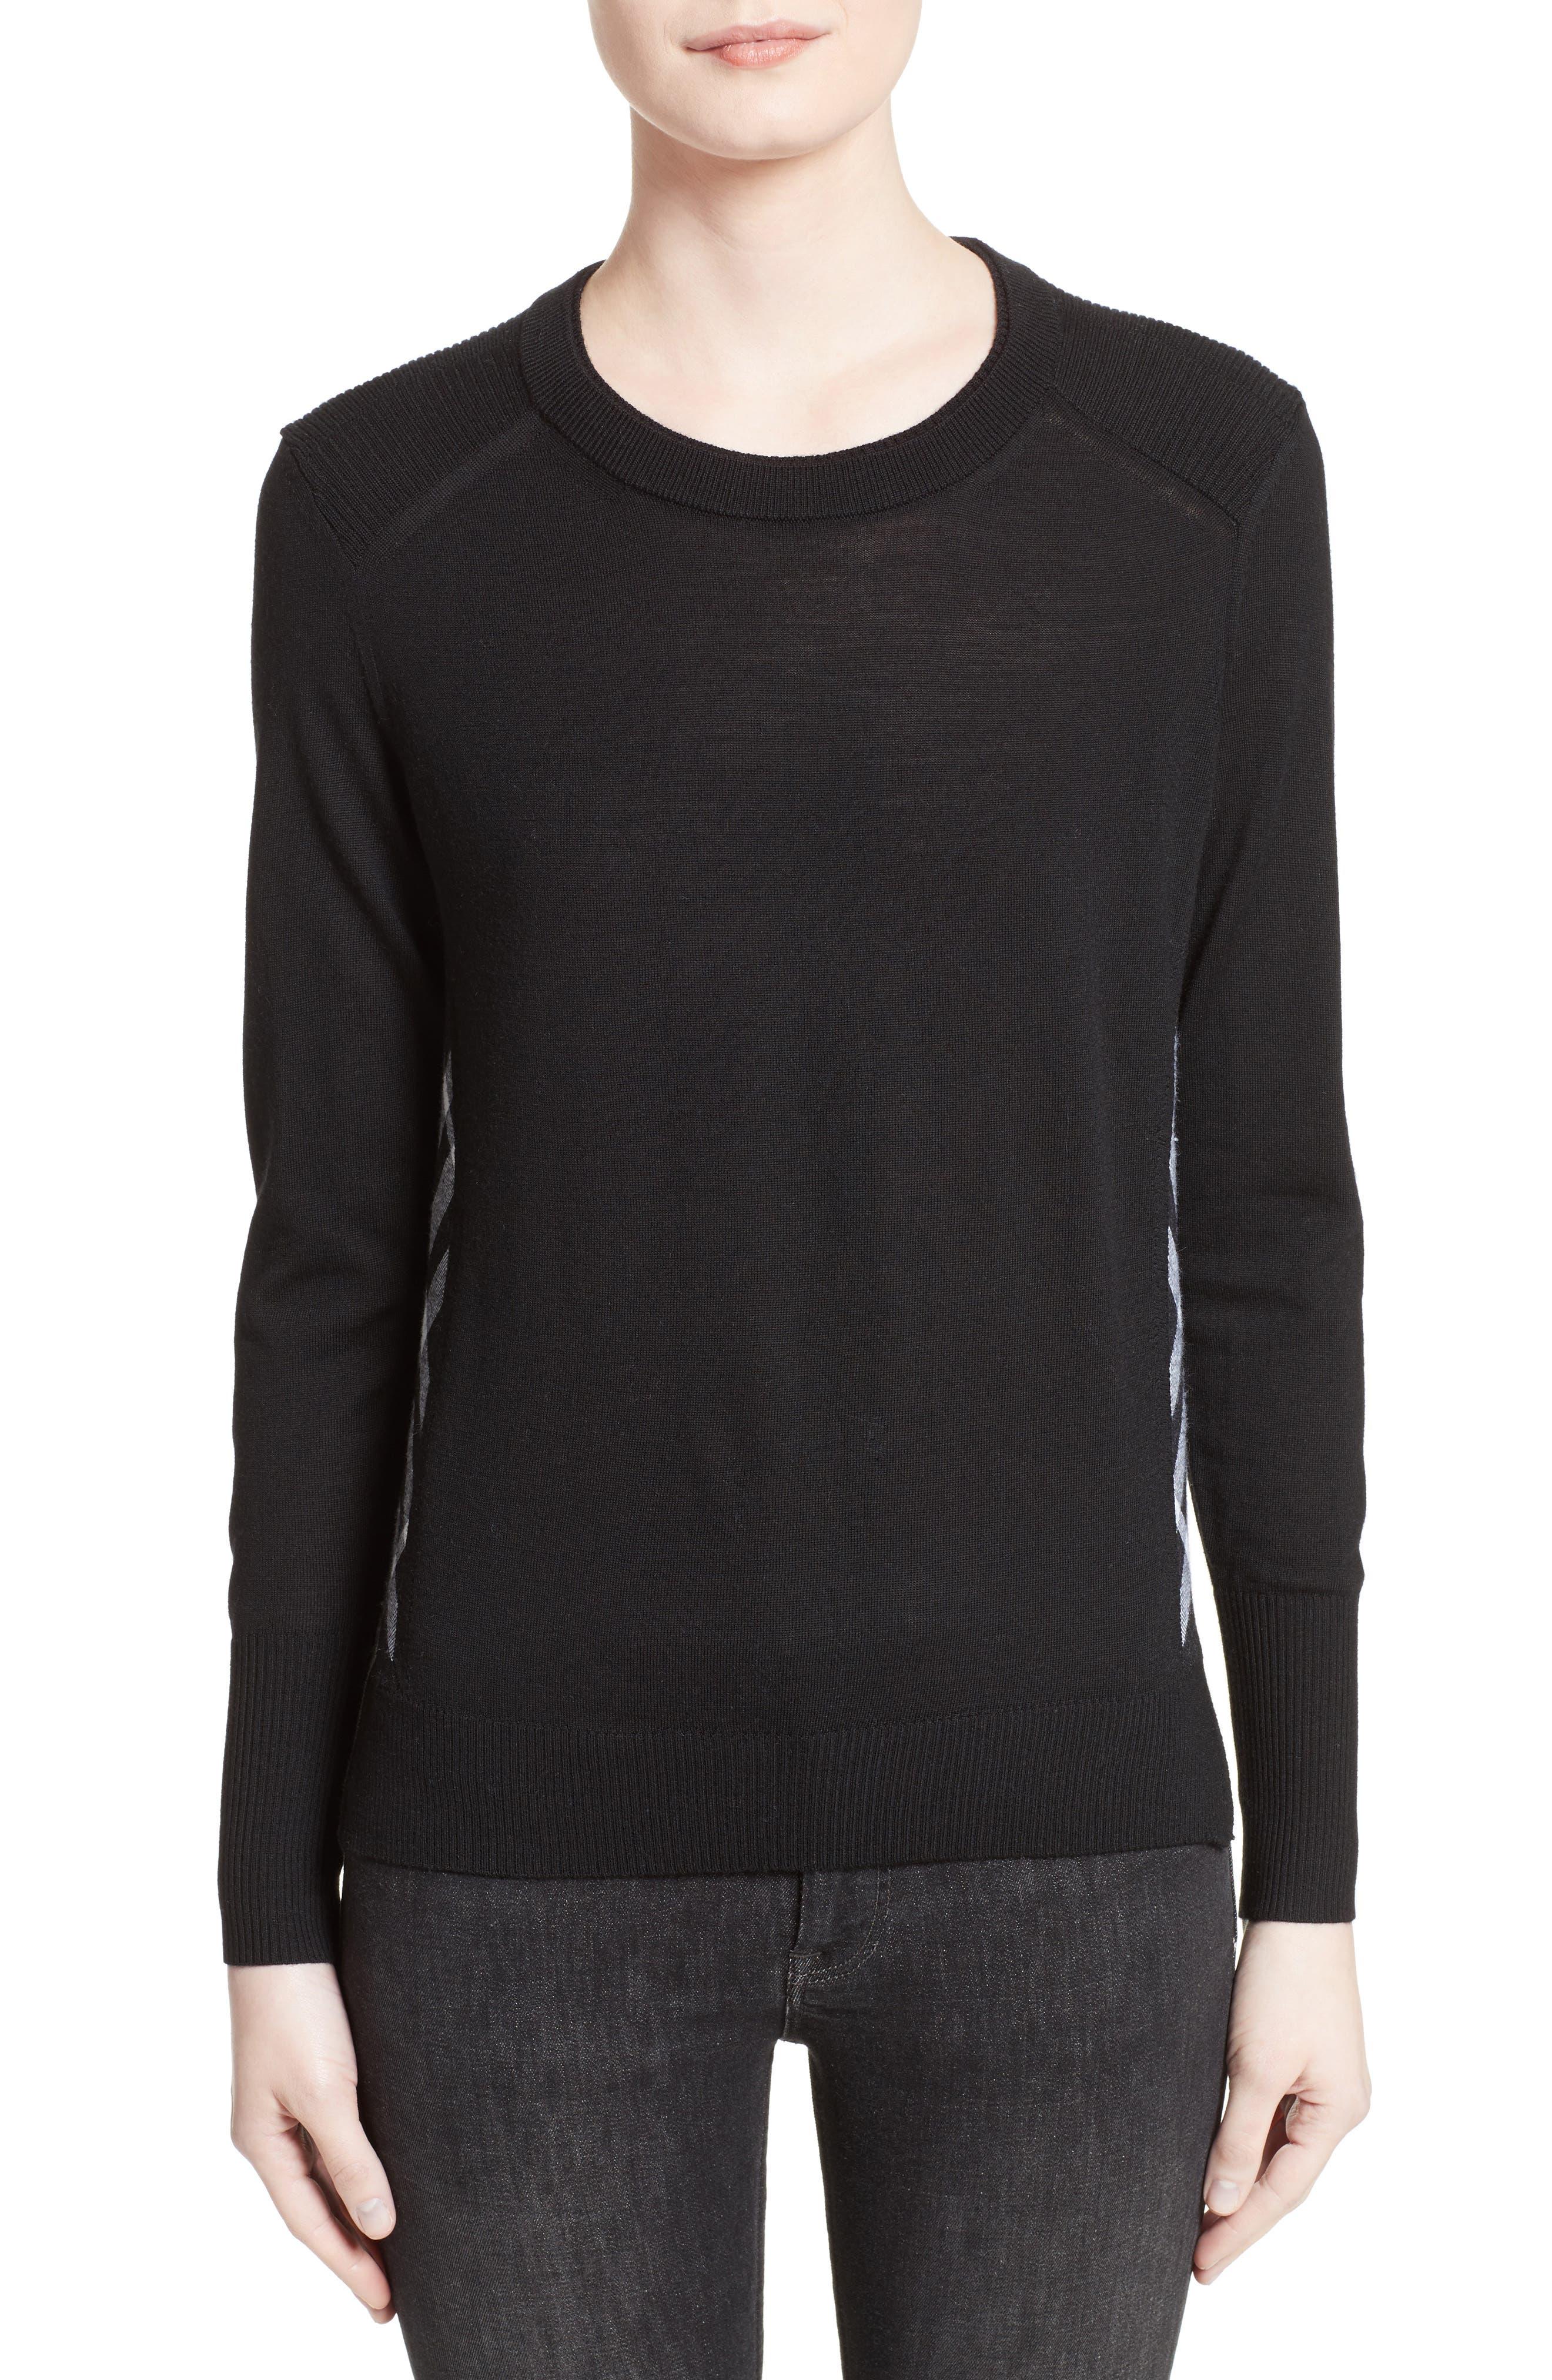 Meigan Merino Wool Sweater,                             Main thumbnail 1, color,                             001